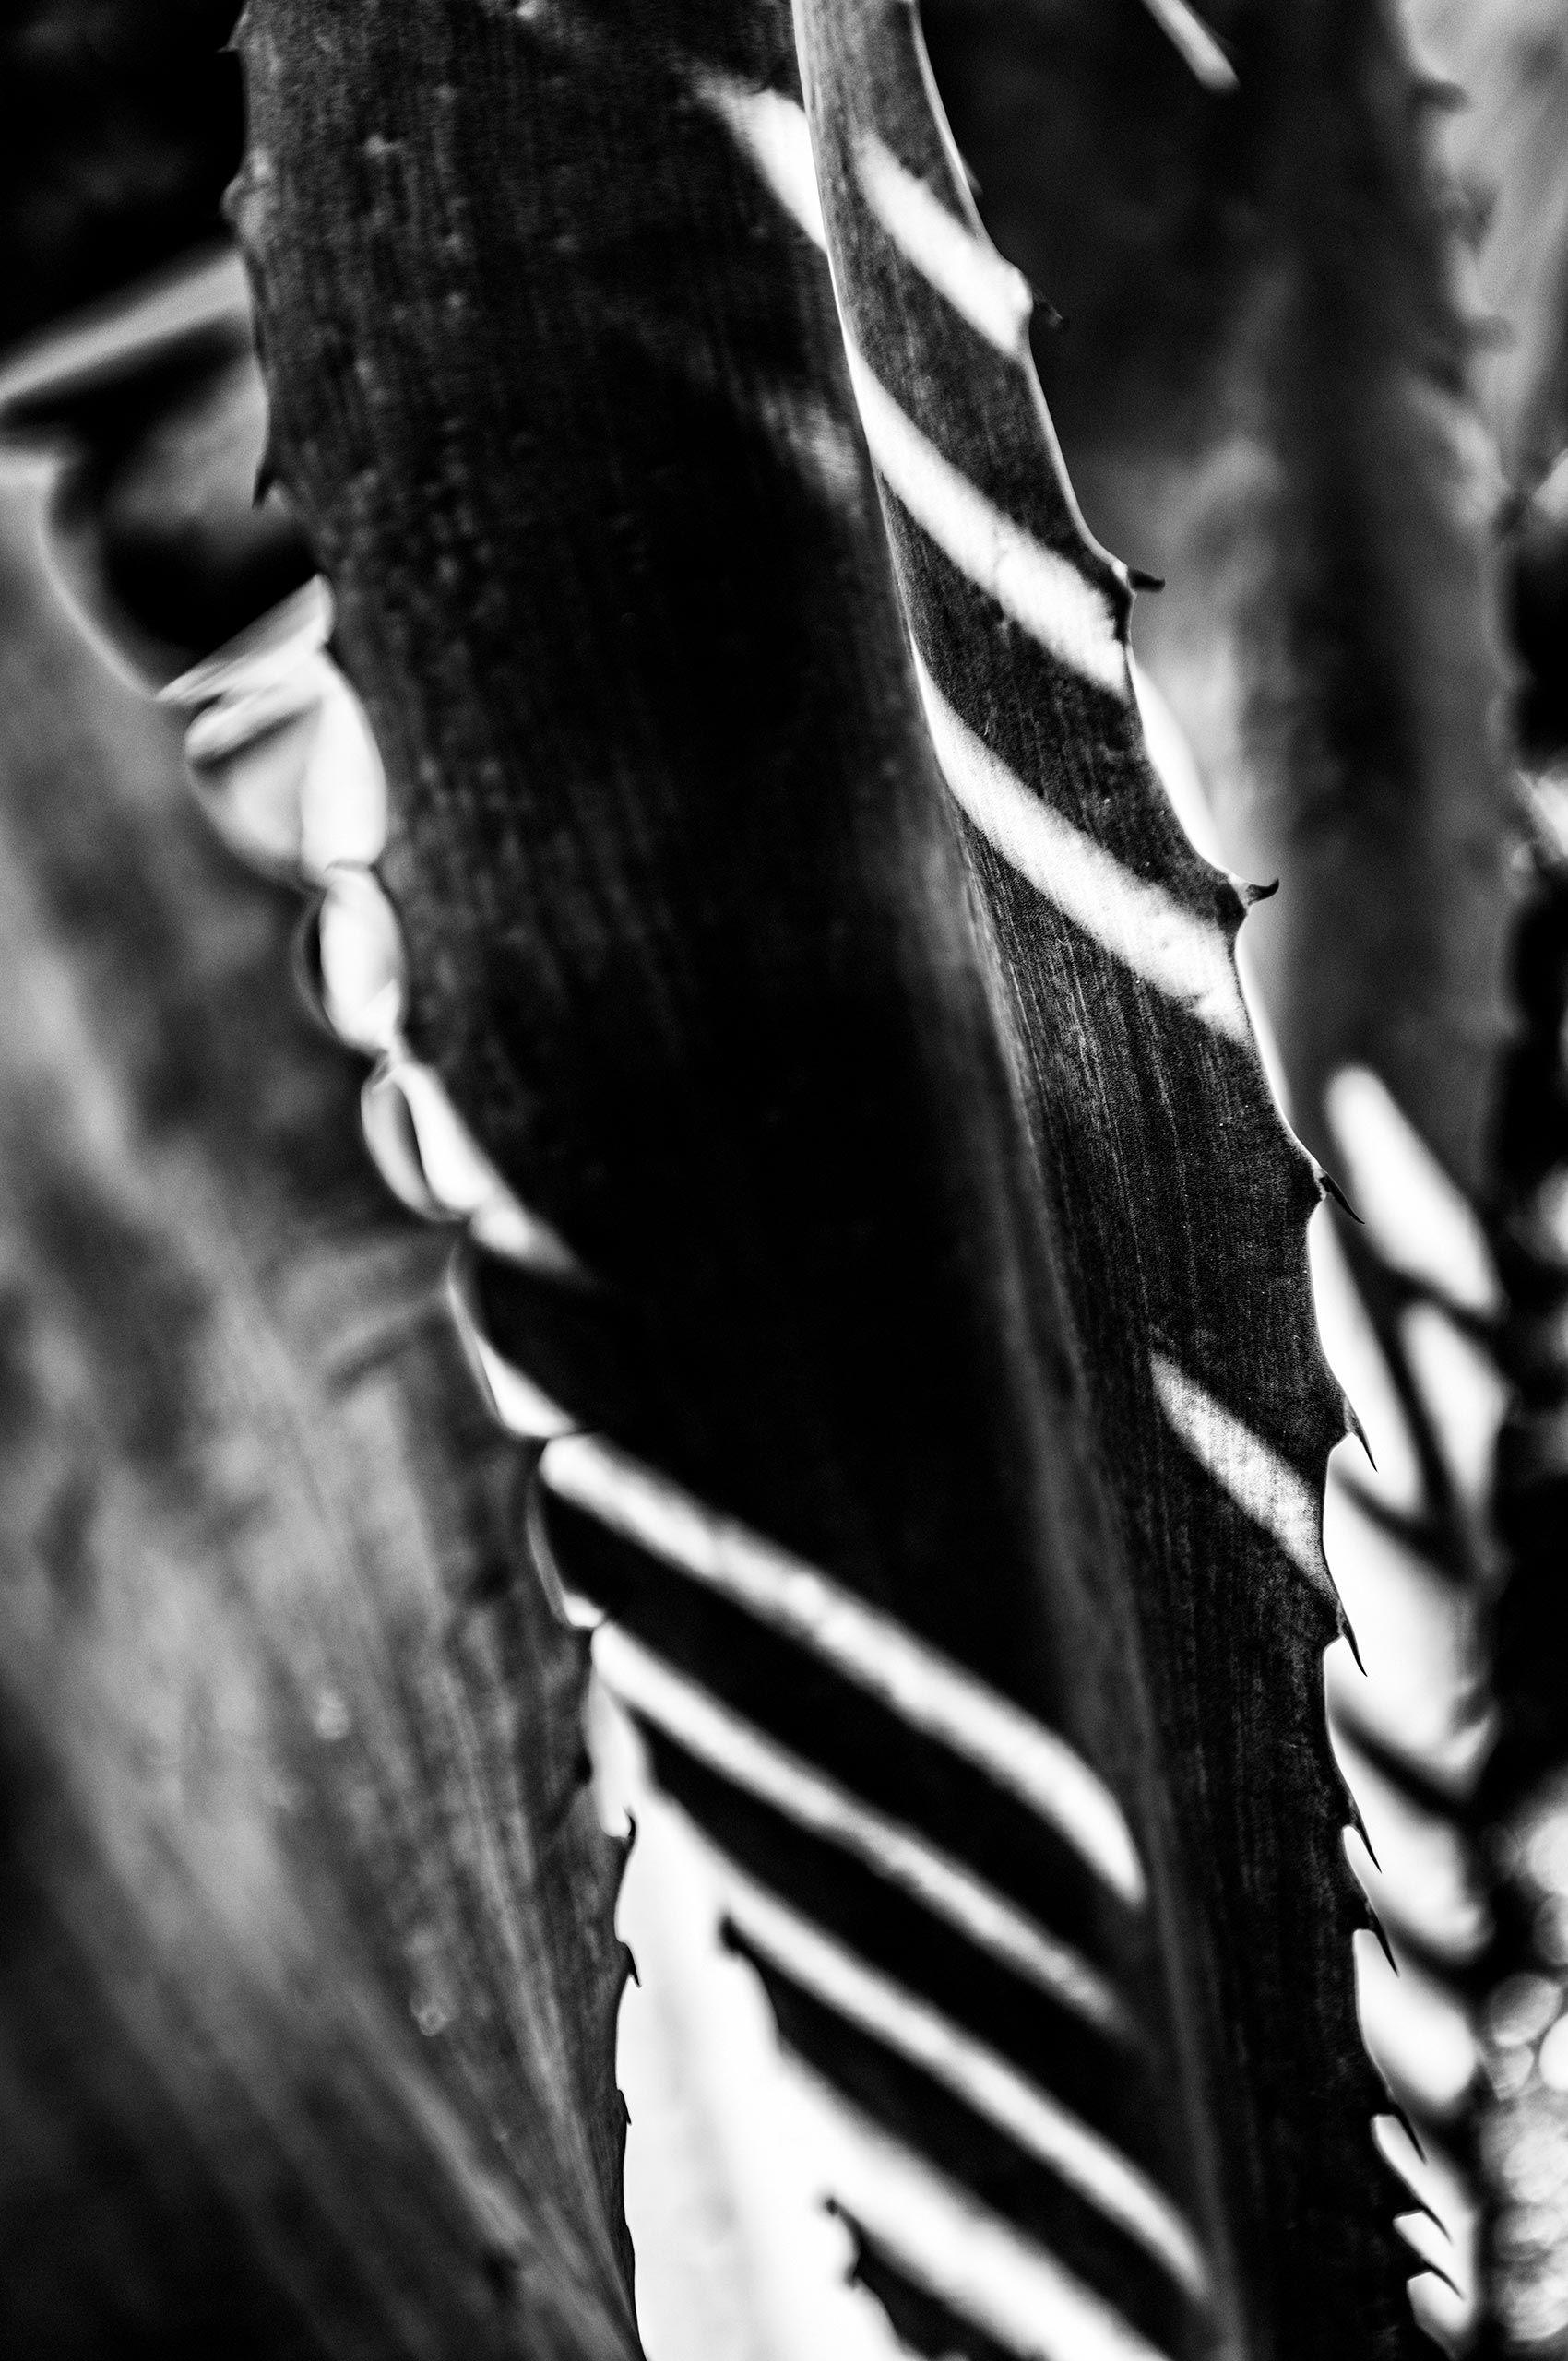 cactus-shadows-HenrikOlundPhotography.jpg